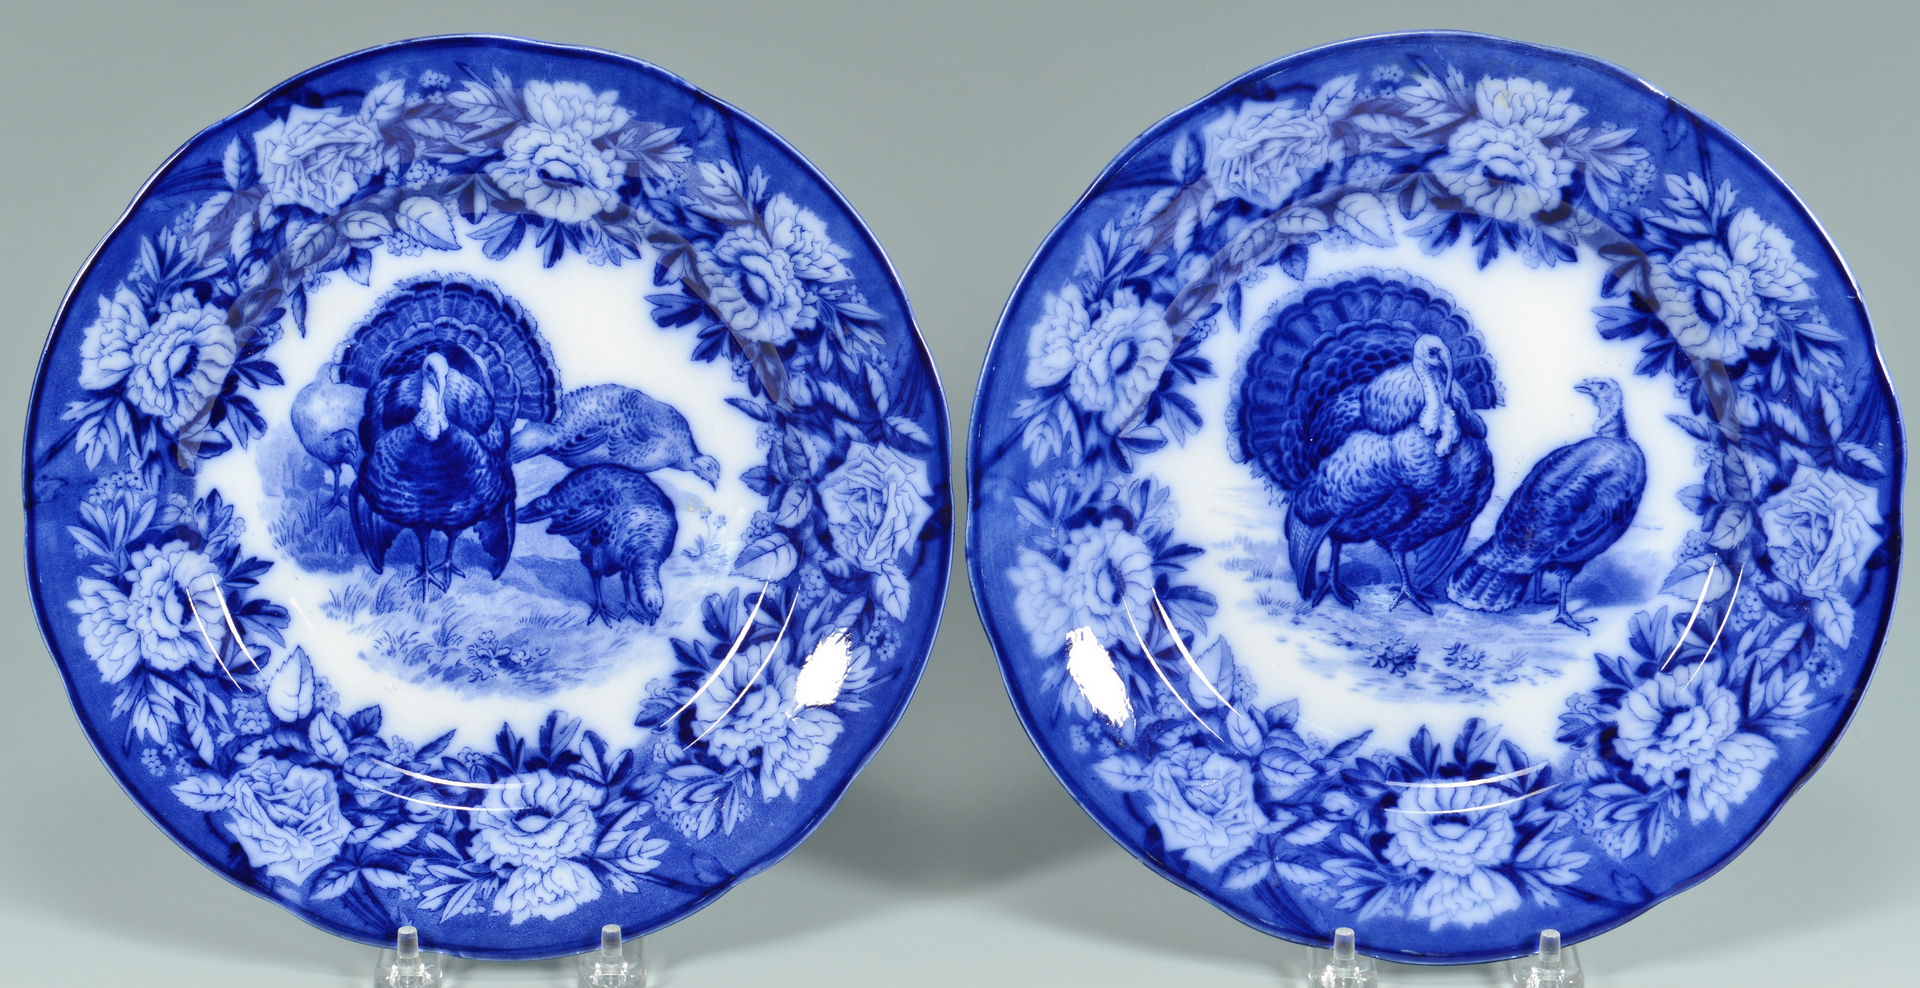 Lot 3088163: Turkey Platter with 12 plates, Flow Blue